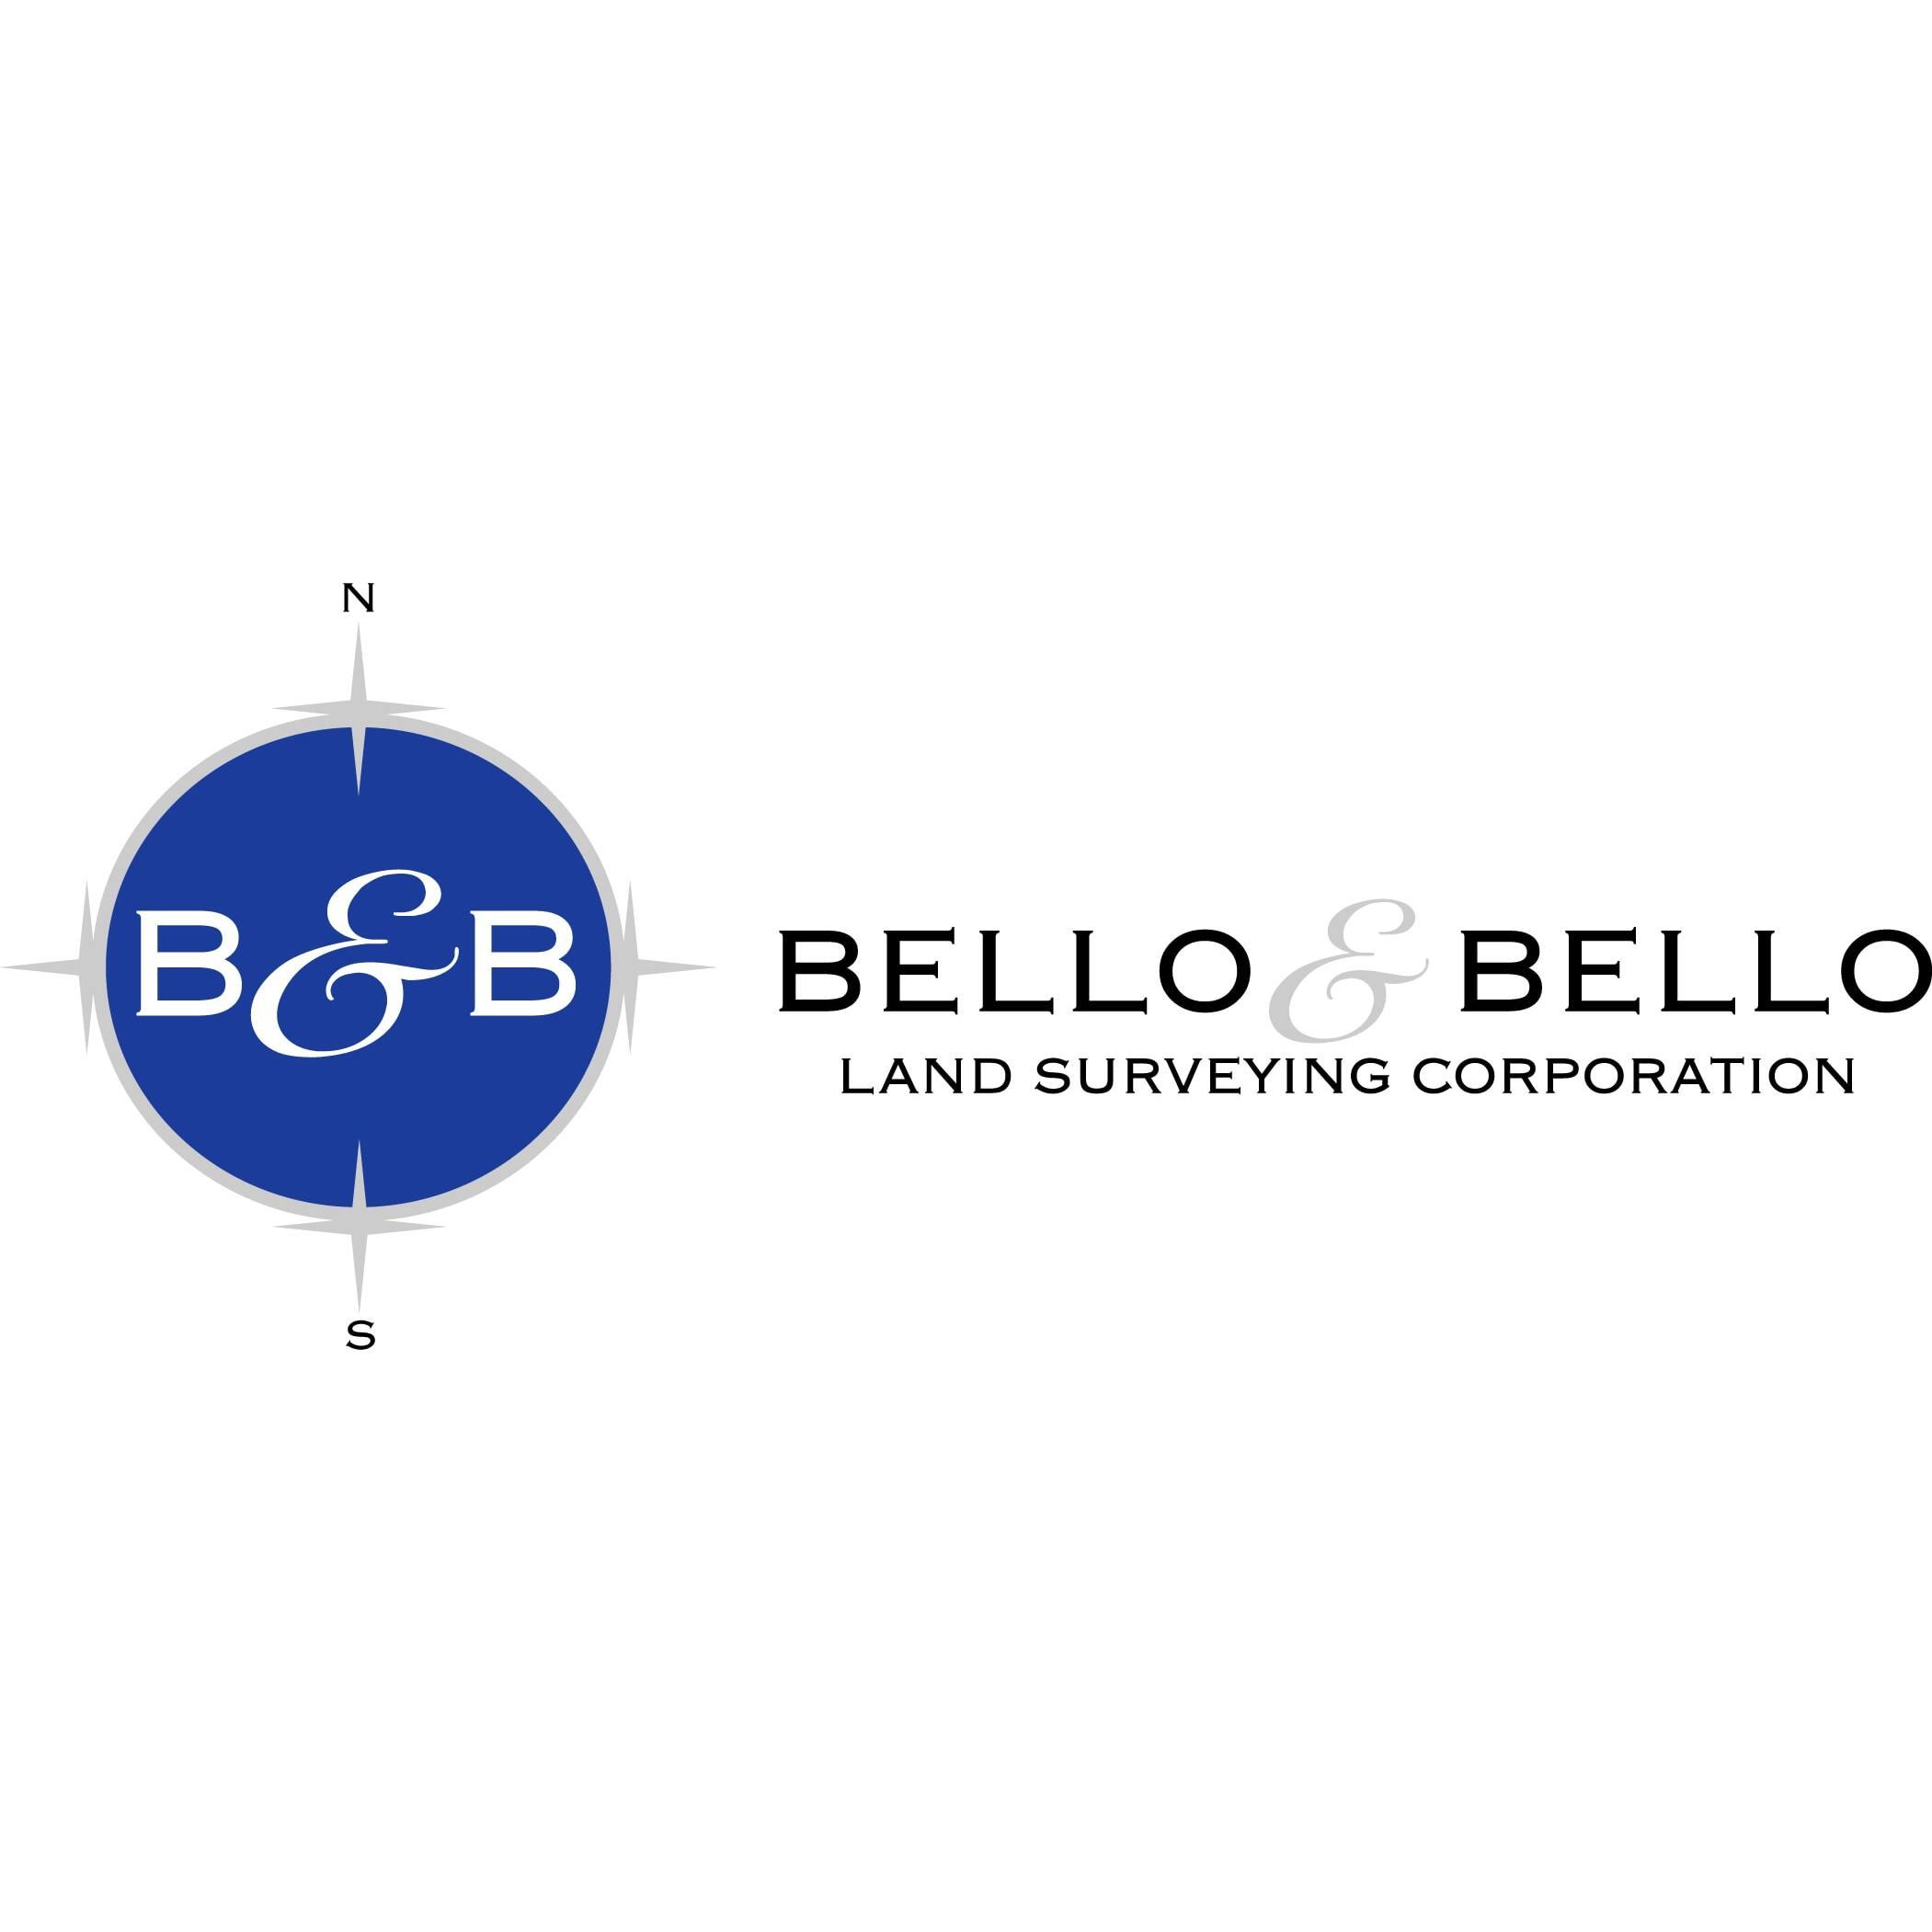 Bello & Bello Land Surveying Corp image 0